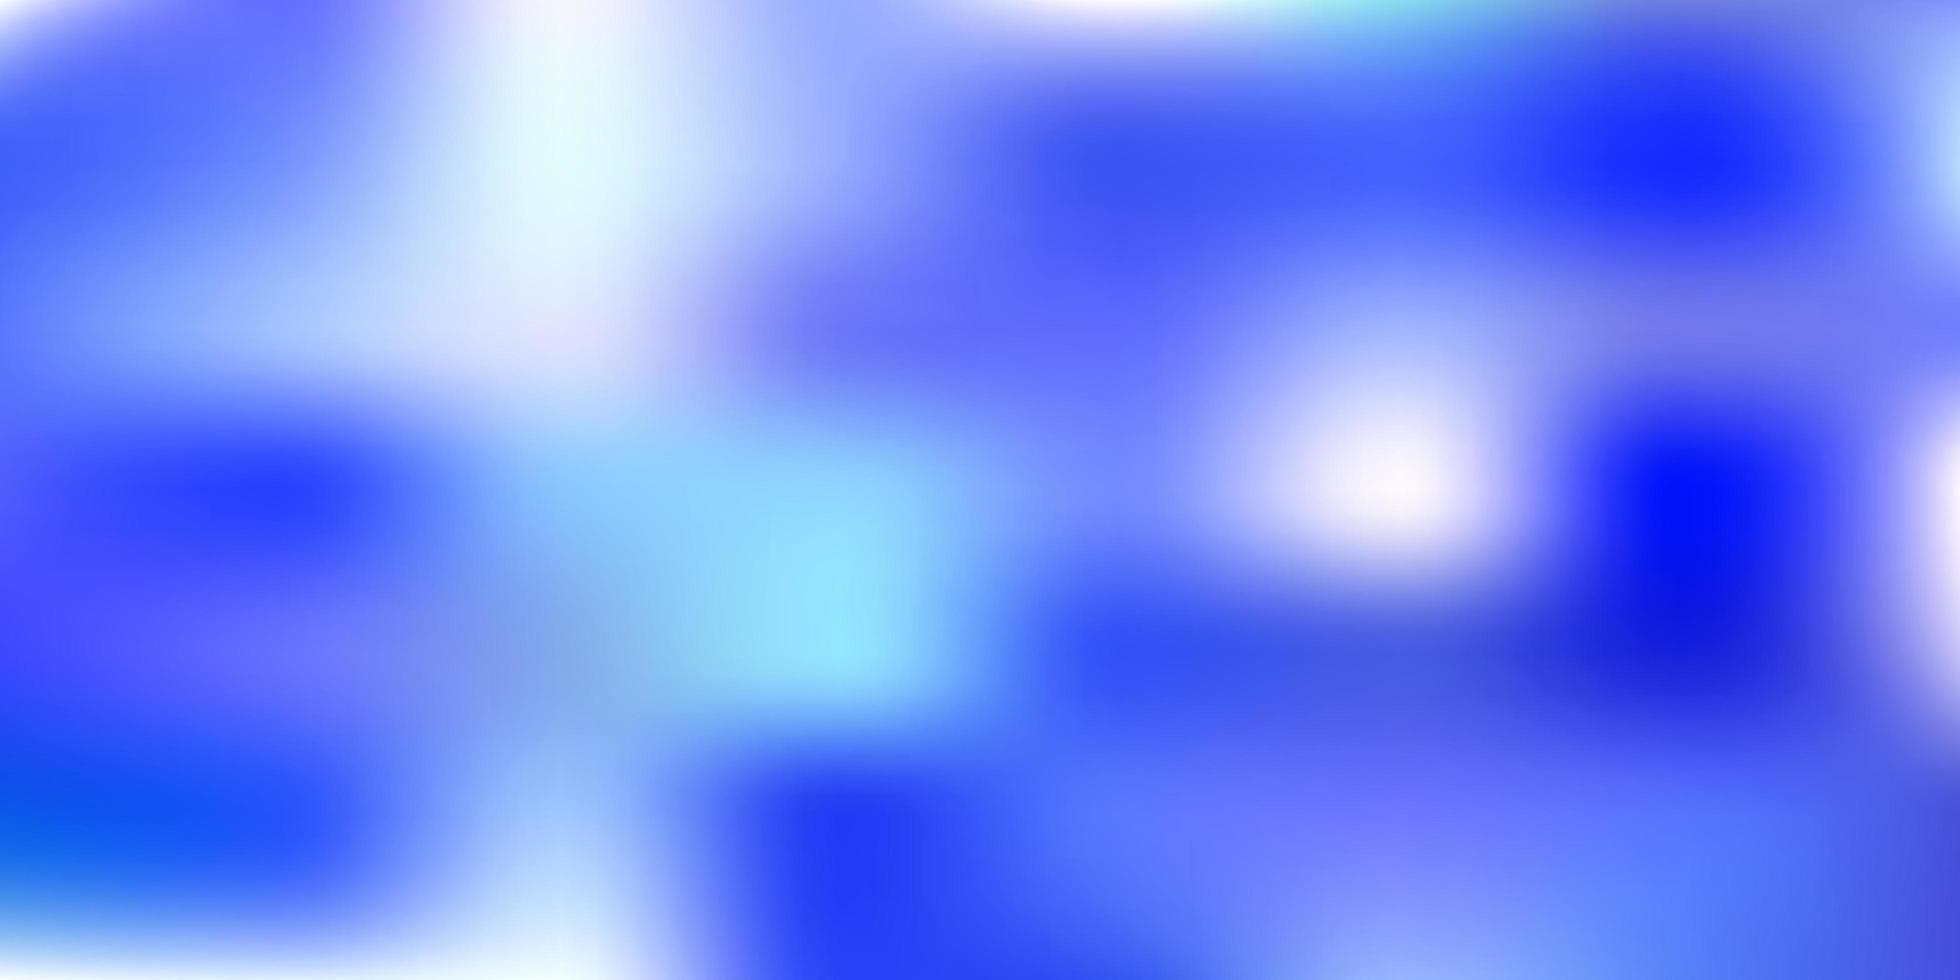 Dark blue blurred template. vector